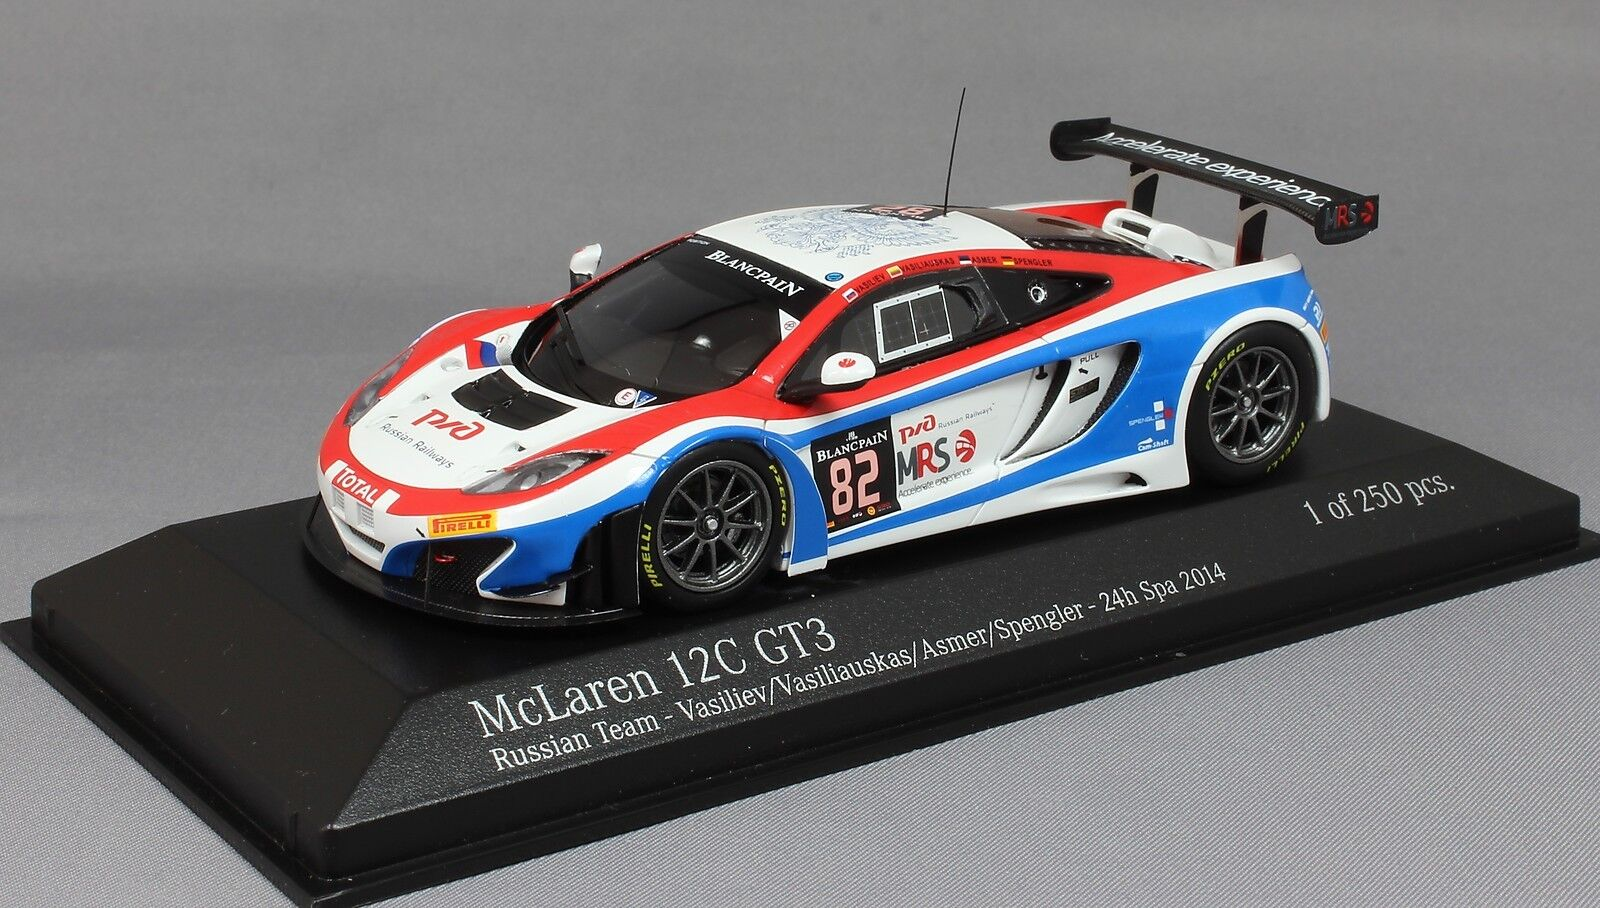 Minichamps McLaren 12 C GT3 SPA SPA SPA 14 Vasilyev Asmer Vasiliauskas Spengler 437141382 6ded2f